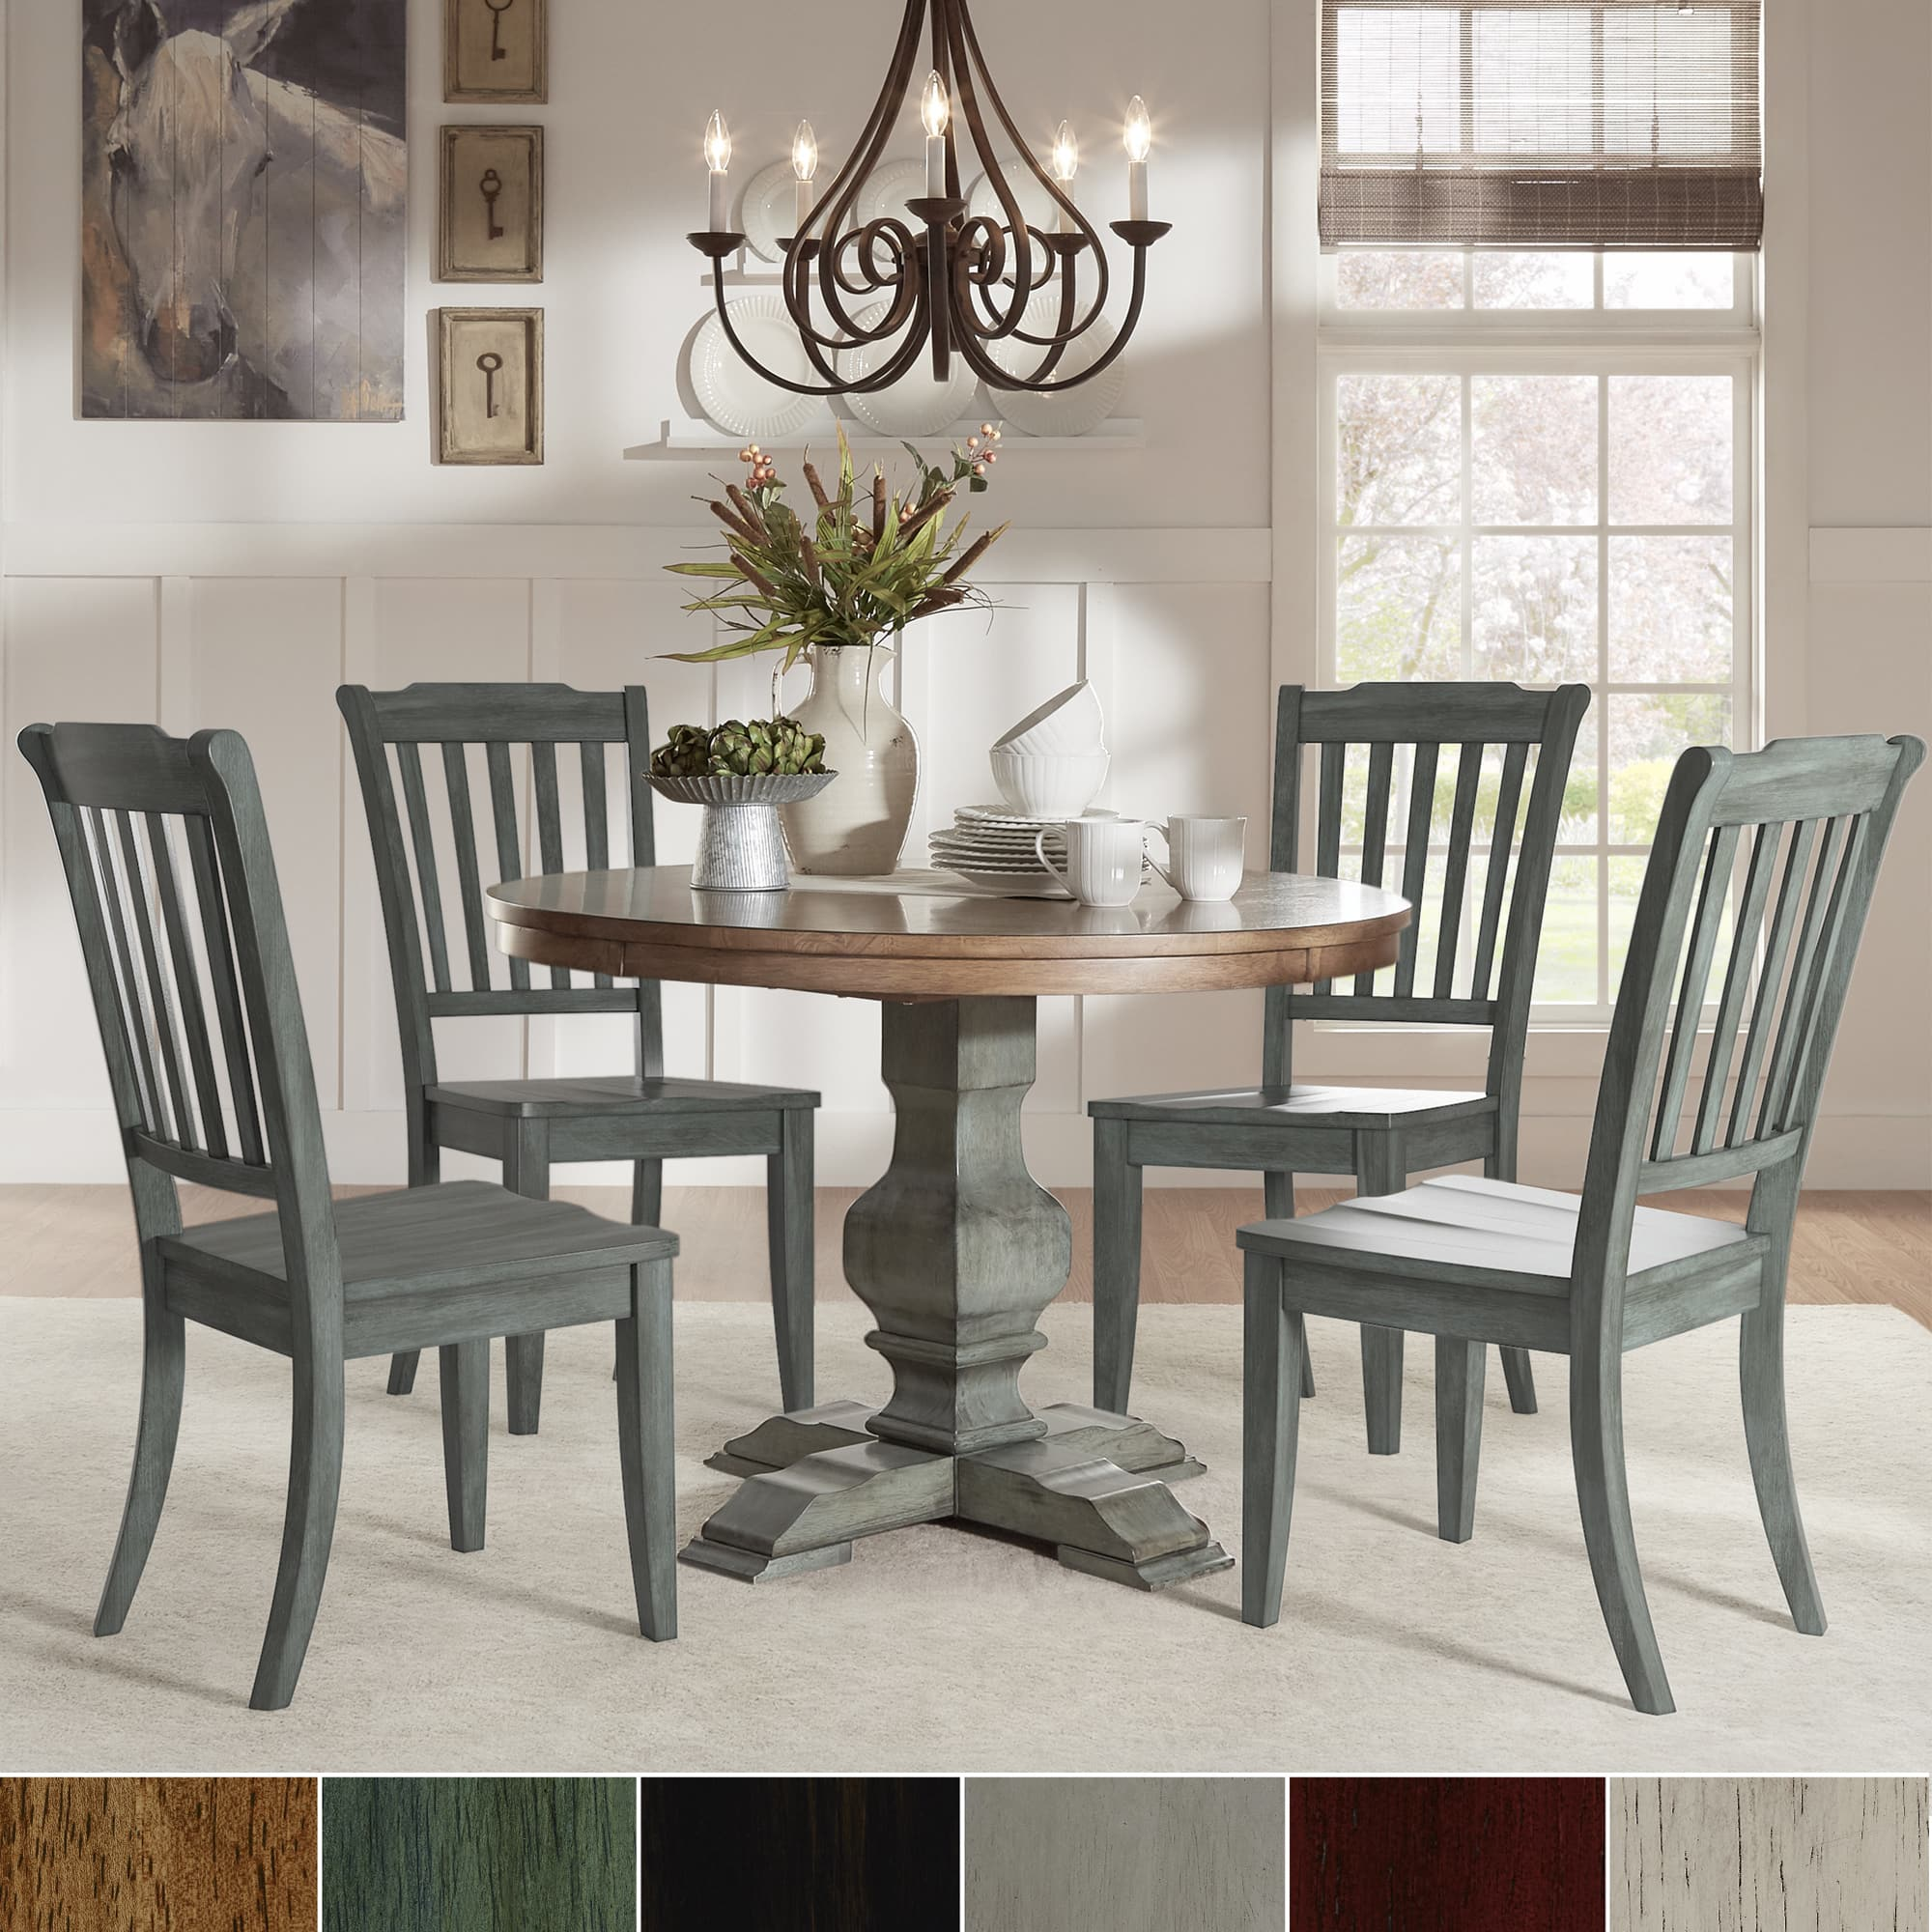 Buy Kitchen & Dining Room Sets Online At Overstock.com